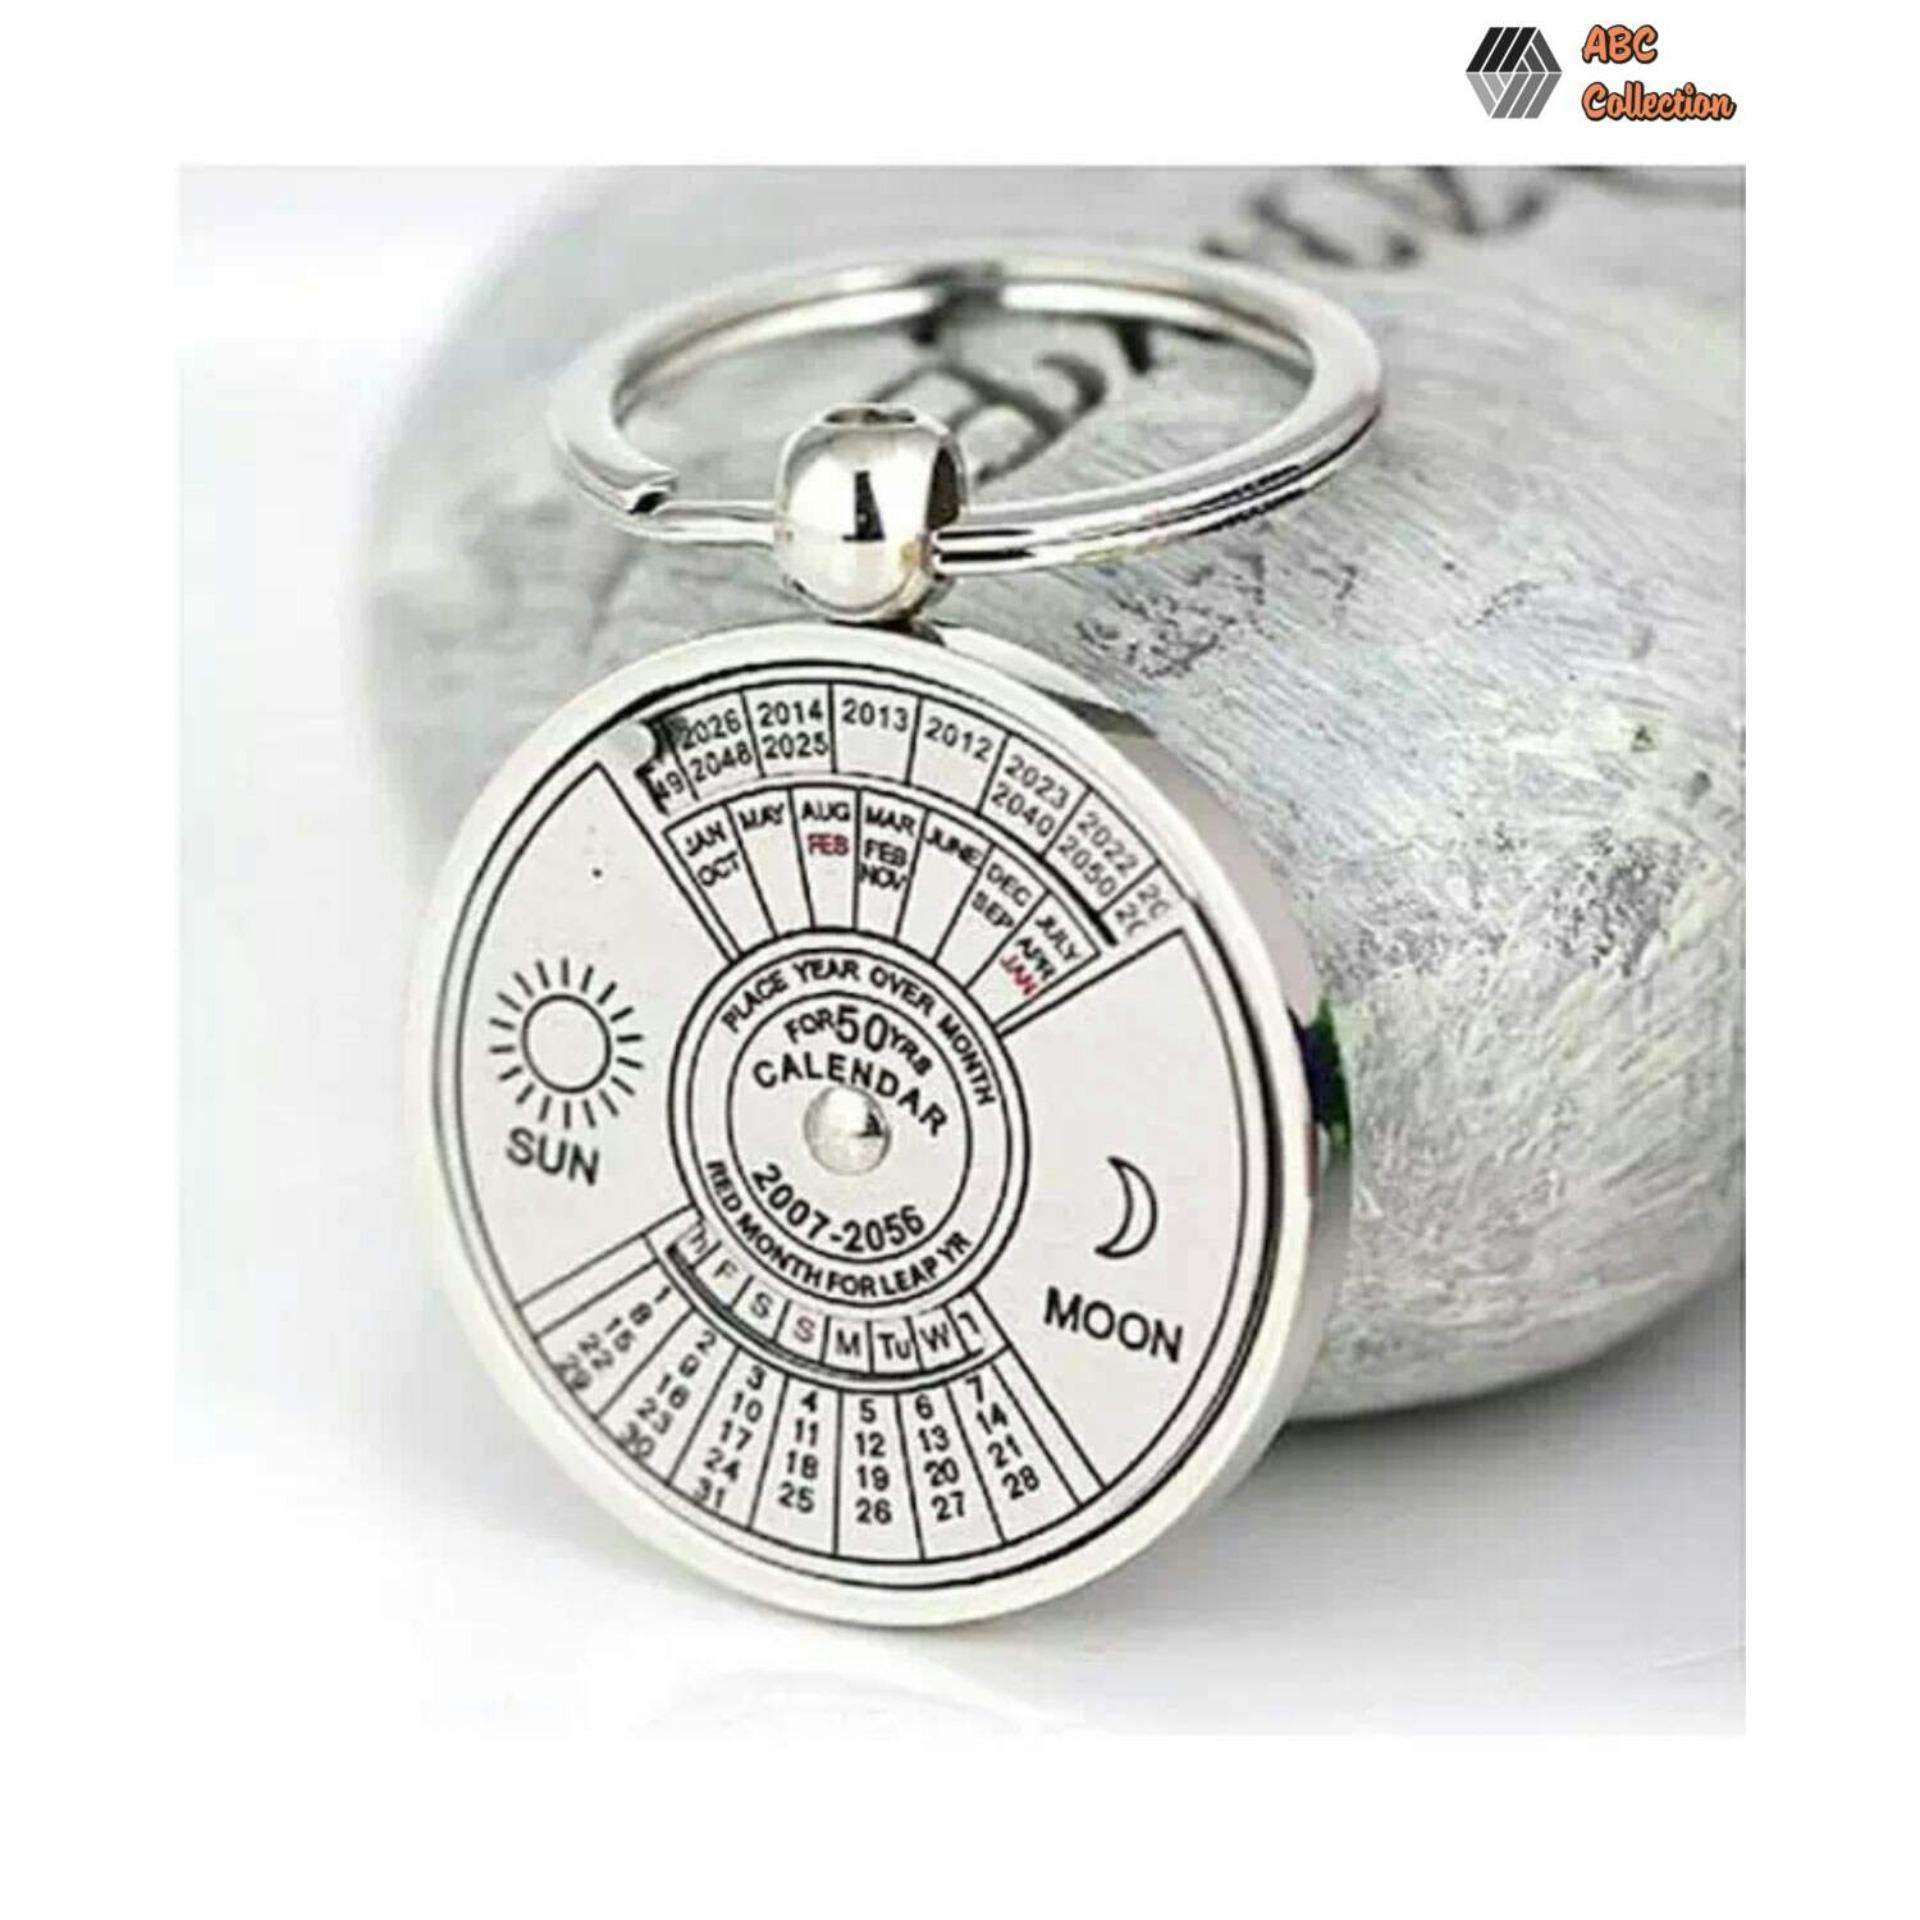 50 Years Perpetual Calendar Keychain